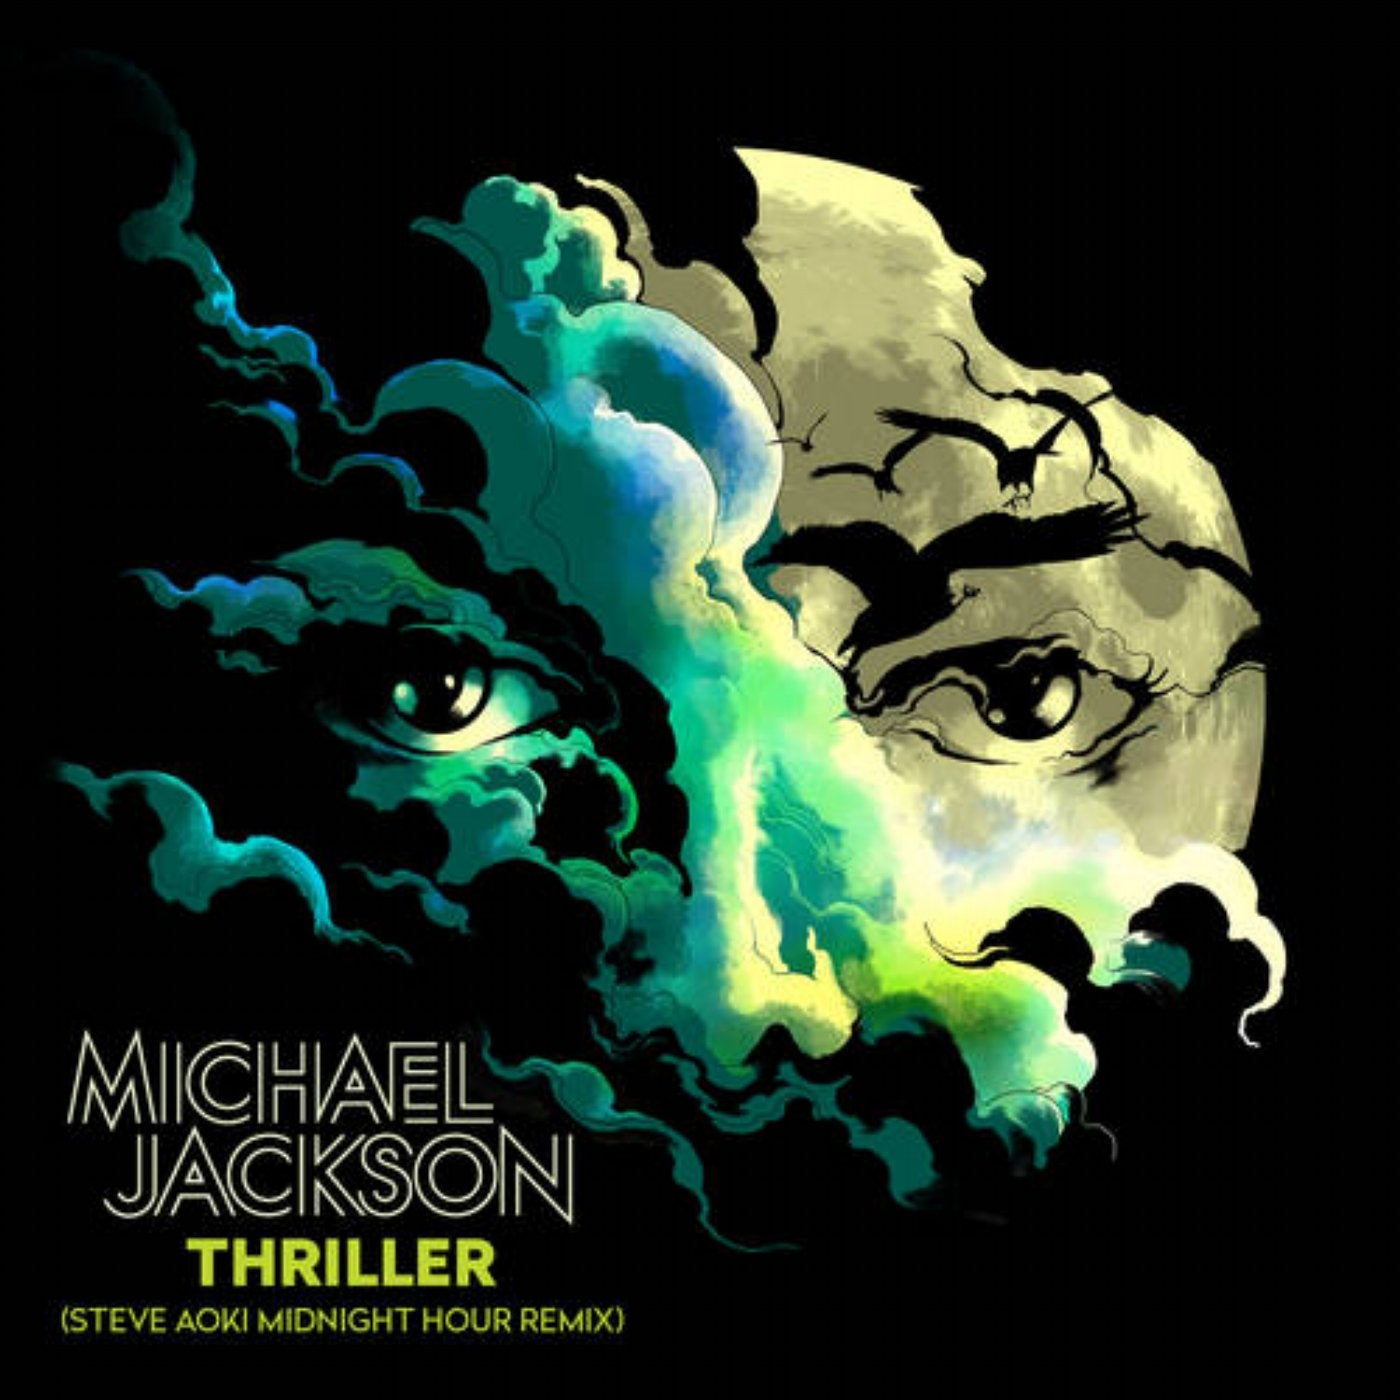 Thriller (Steve Aoki Midnight Hour Remix) (Original Mix)